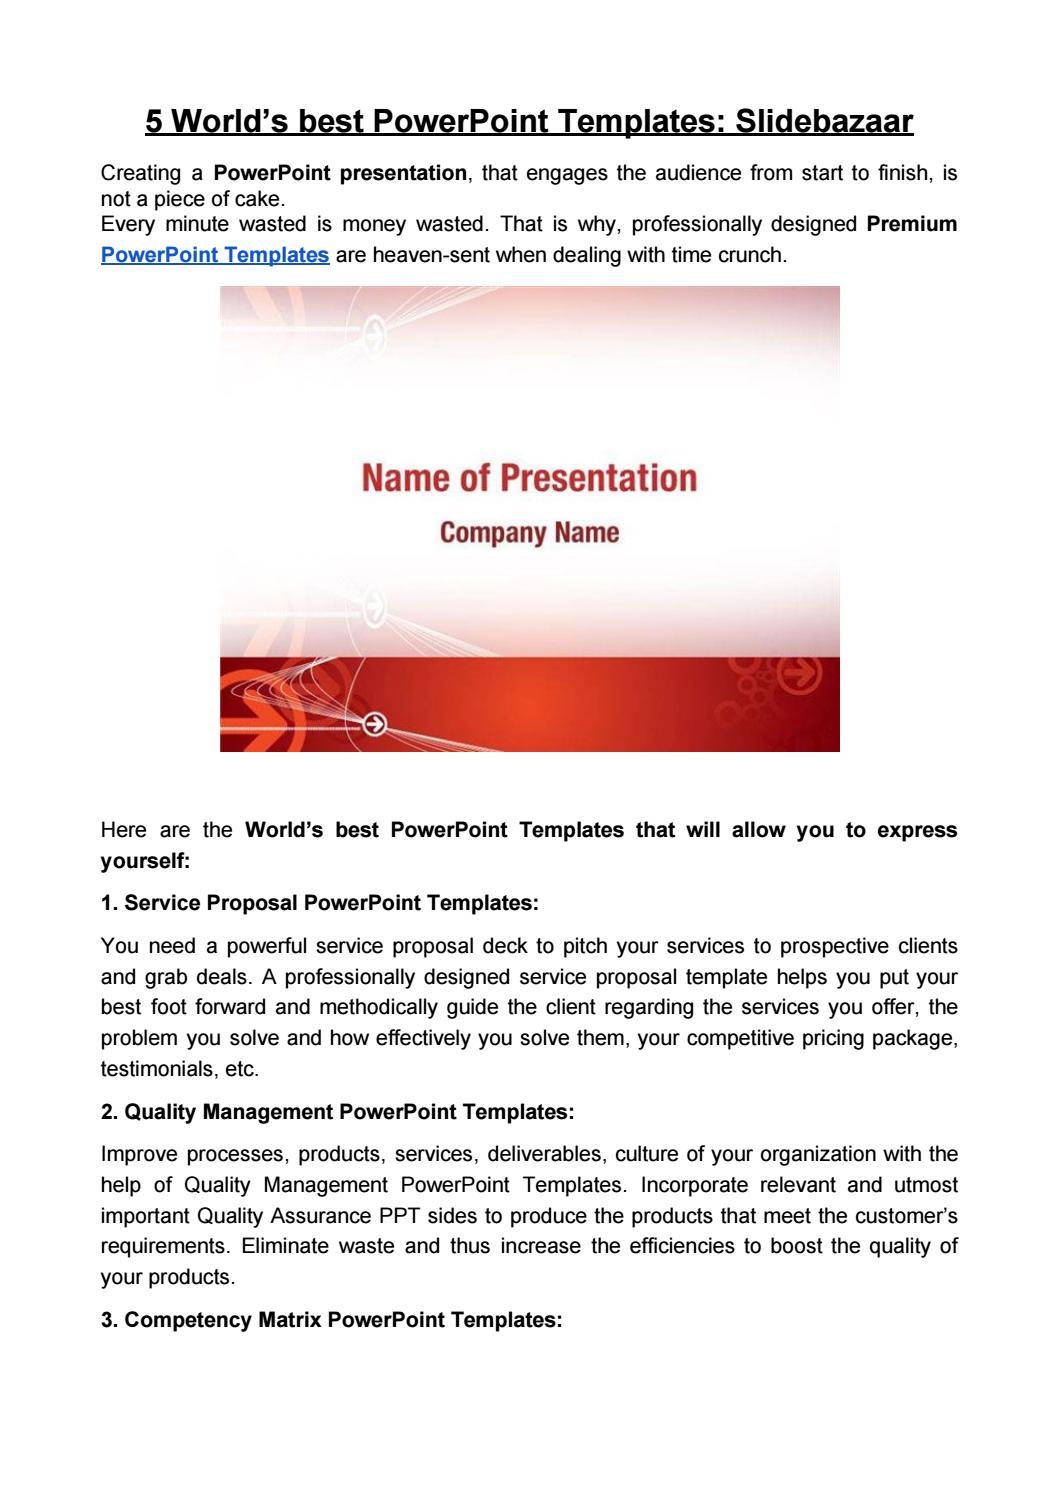 Powerpoint Templates By Slide Bazaar Issuu